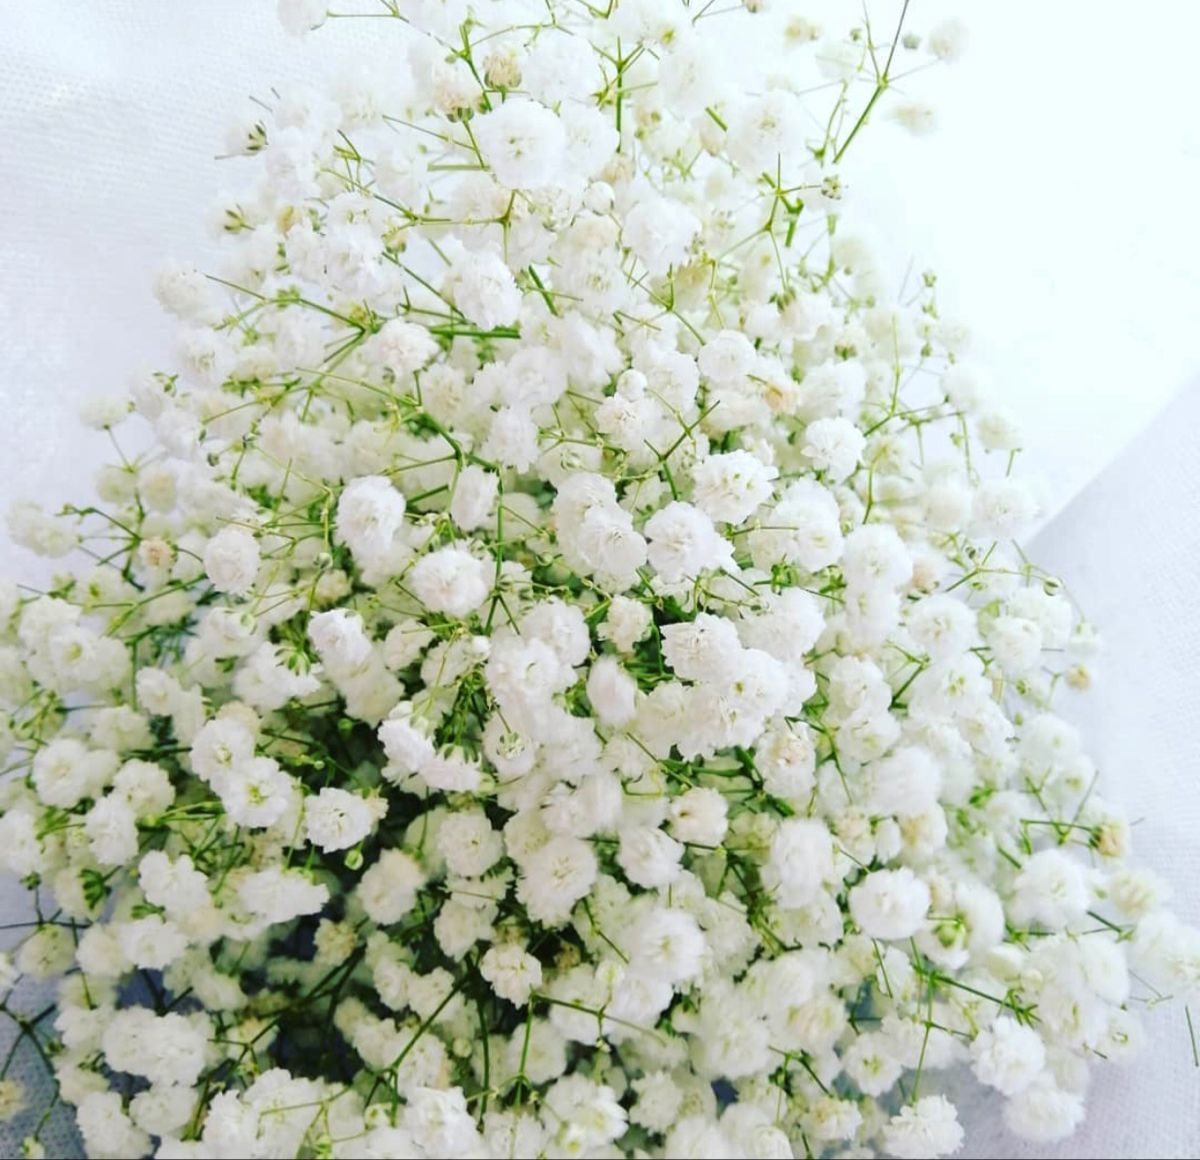 Baby Breath Flowers In 2020 Online Wedding Flowers Baby S Breath Wedding Flowers Flowers For Sale